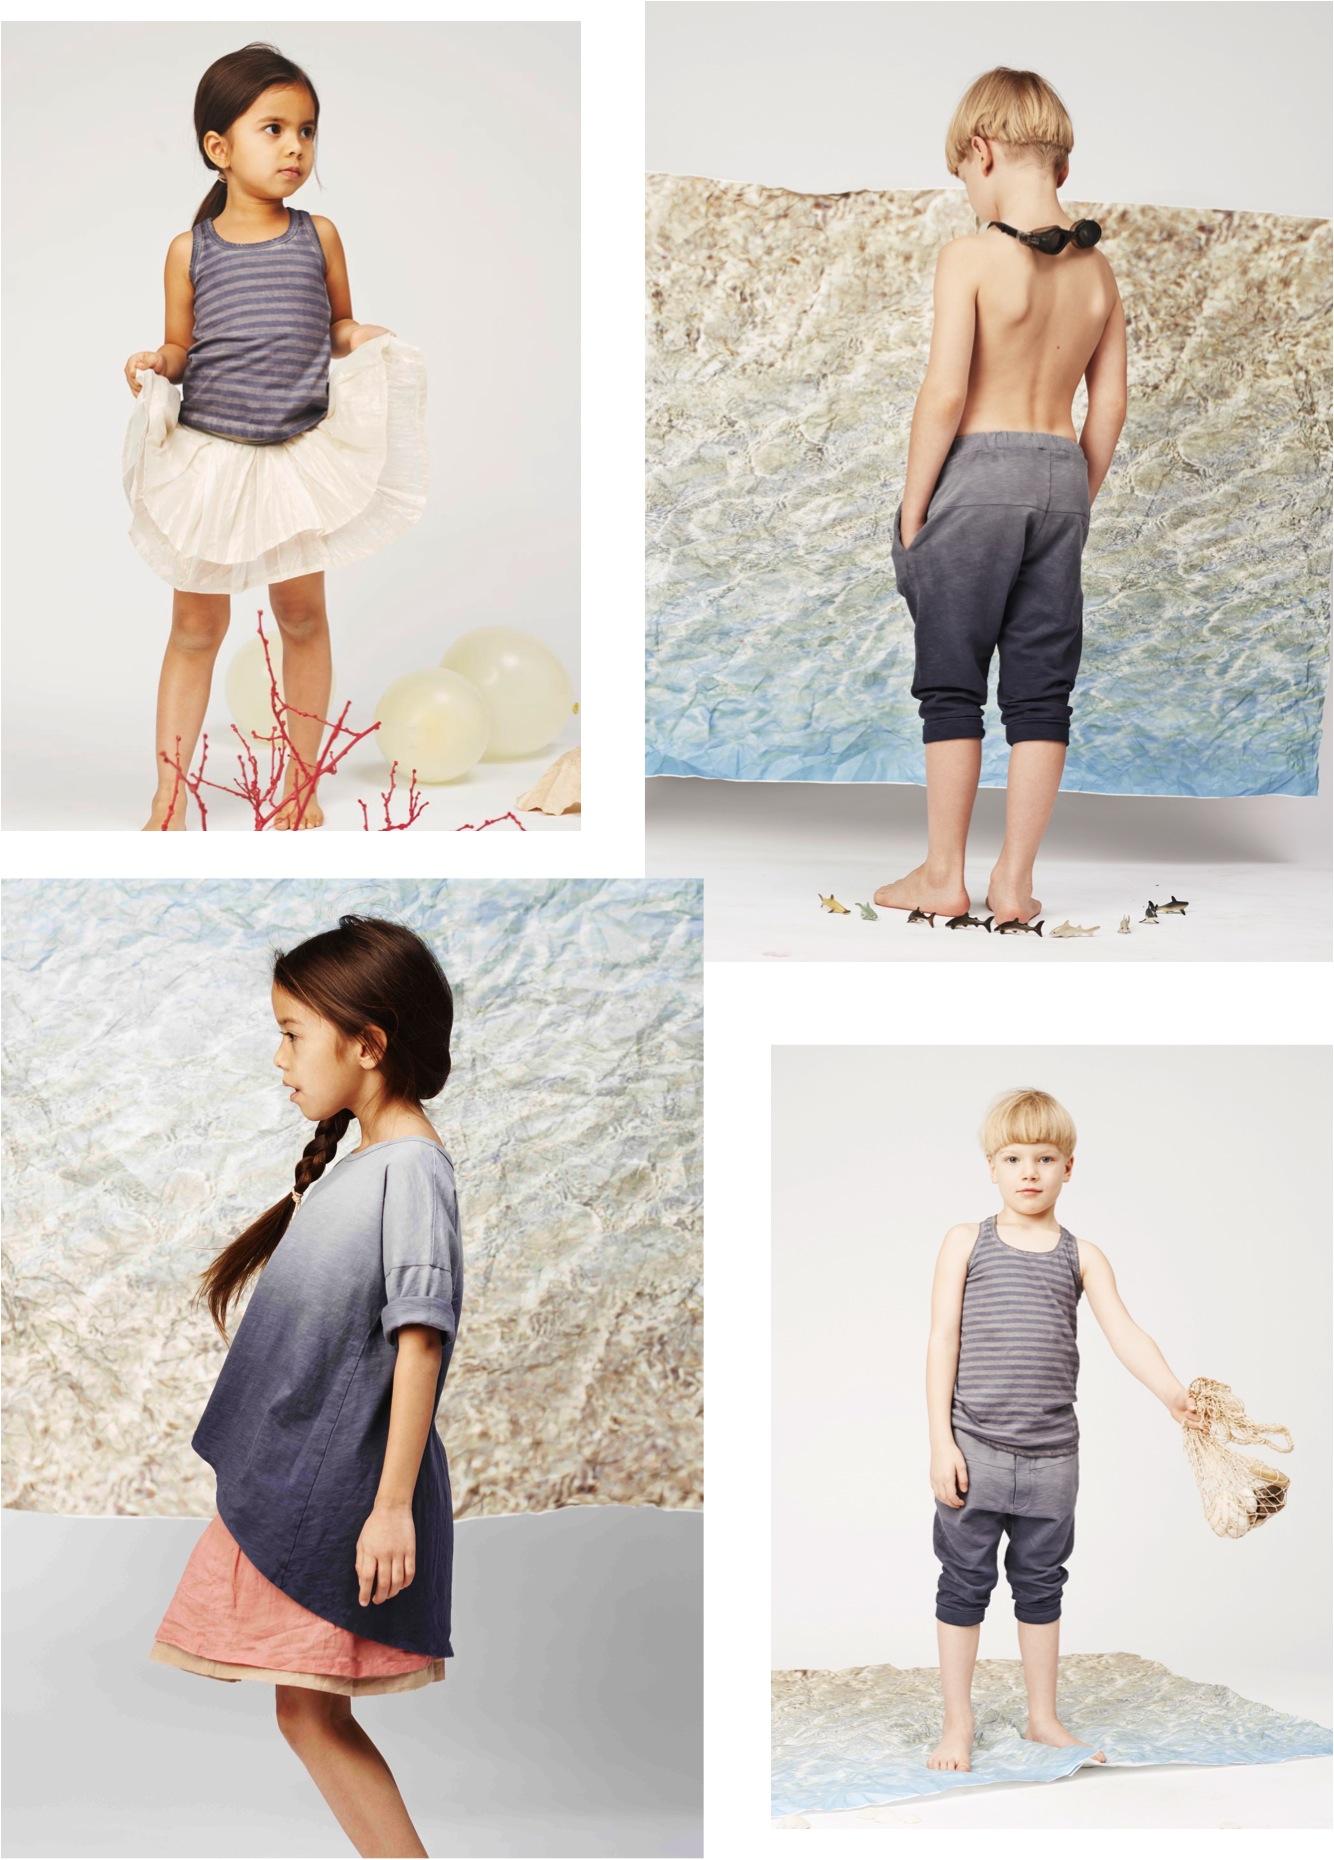 Polish fashion designers